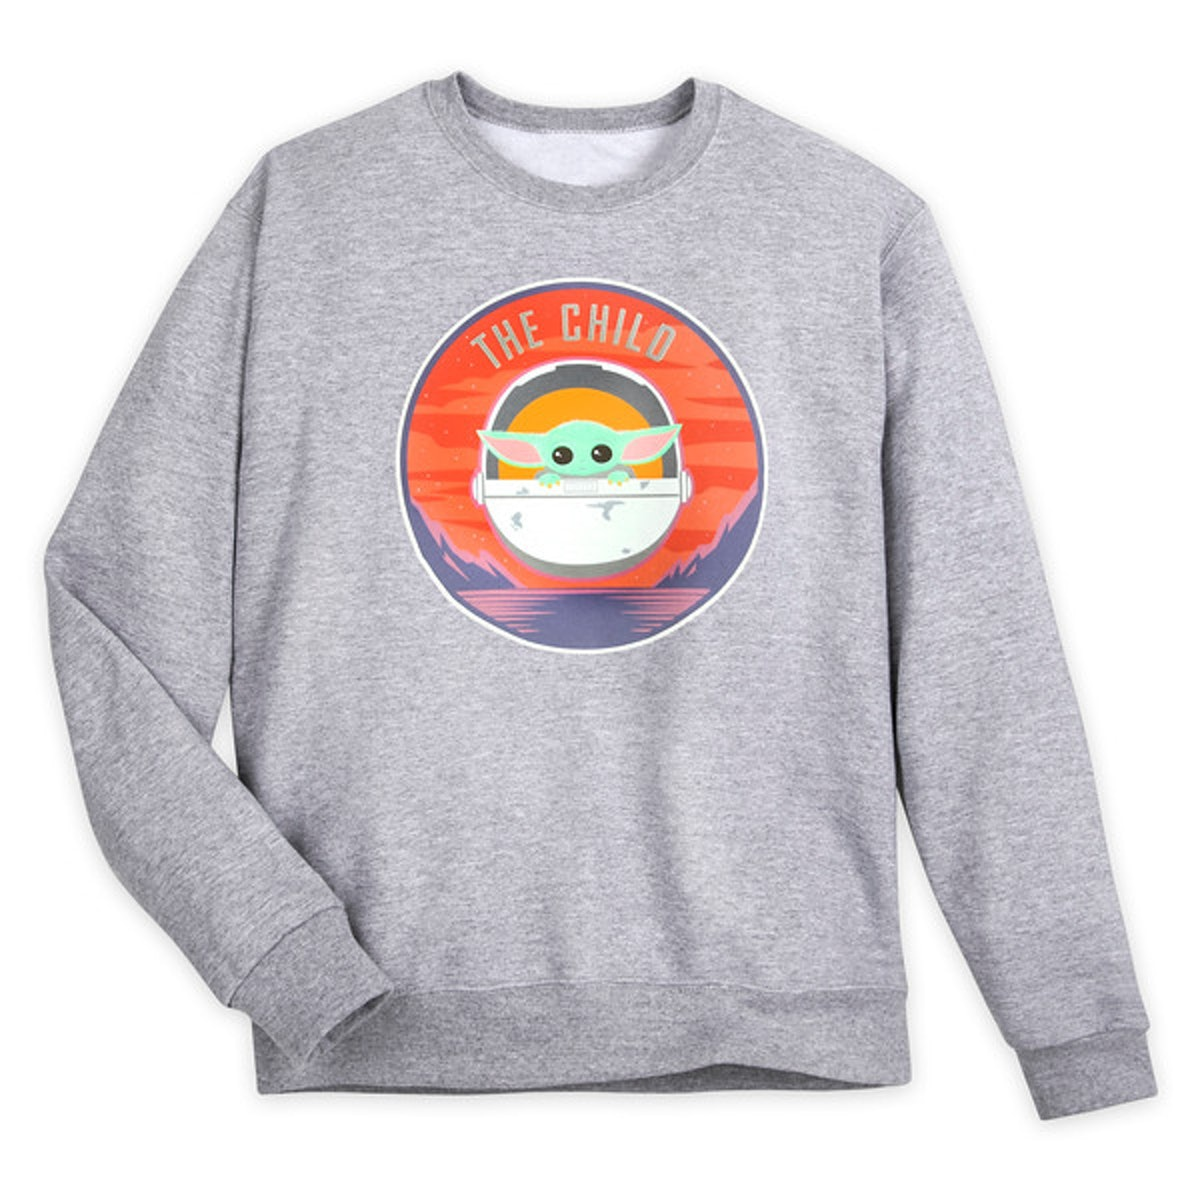 The Child Sweatshirt for Adults – 'Star Wars: The Mandalorian'